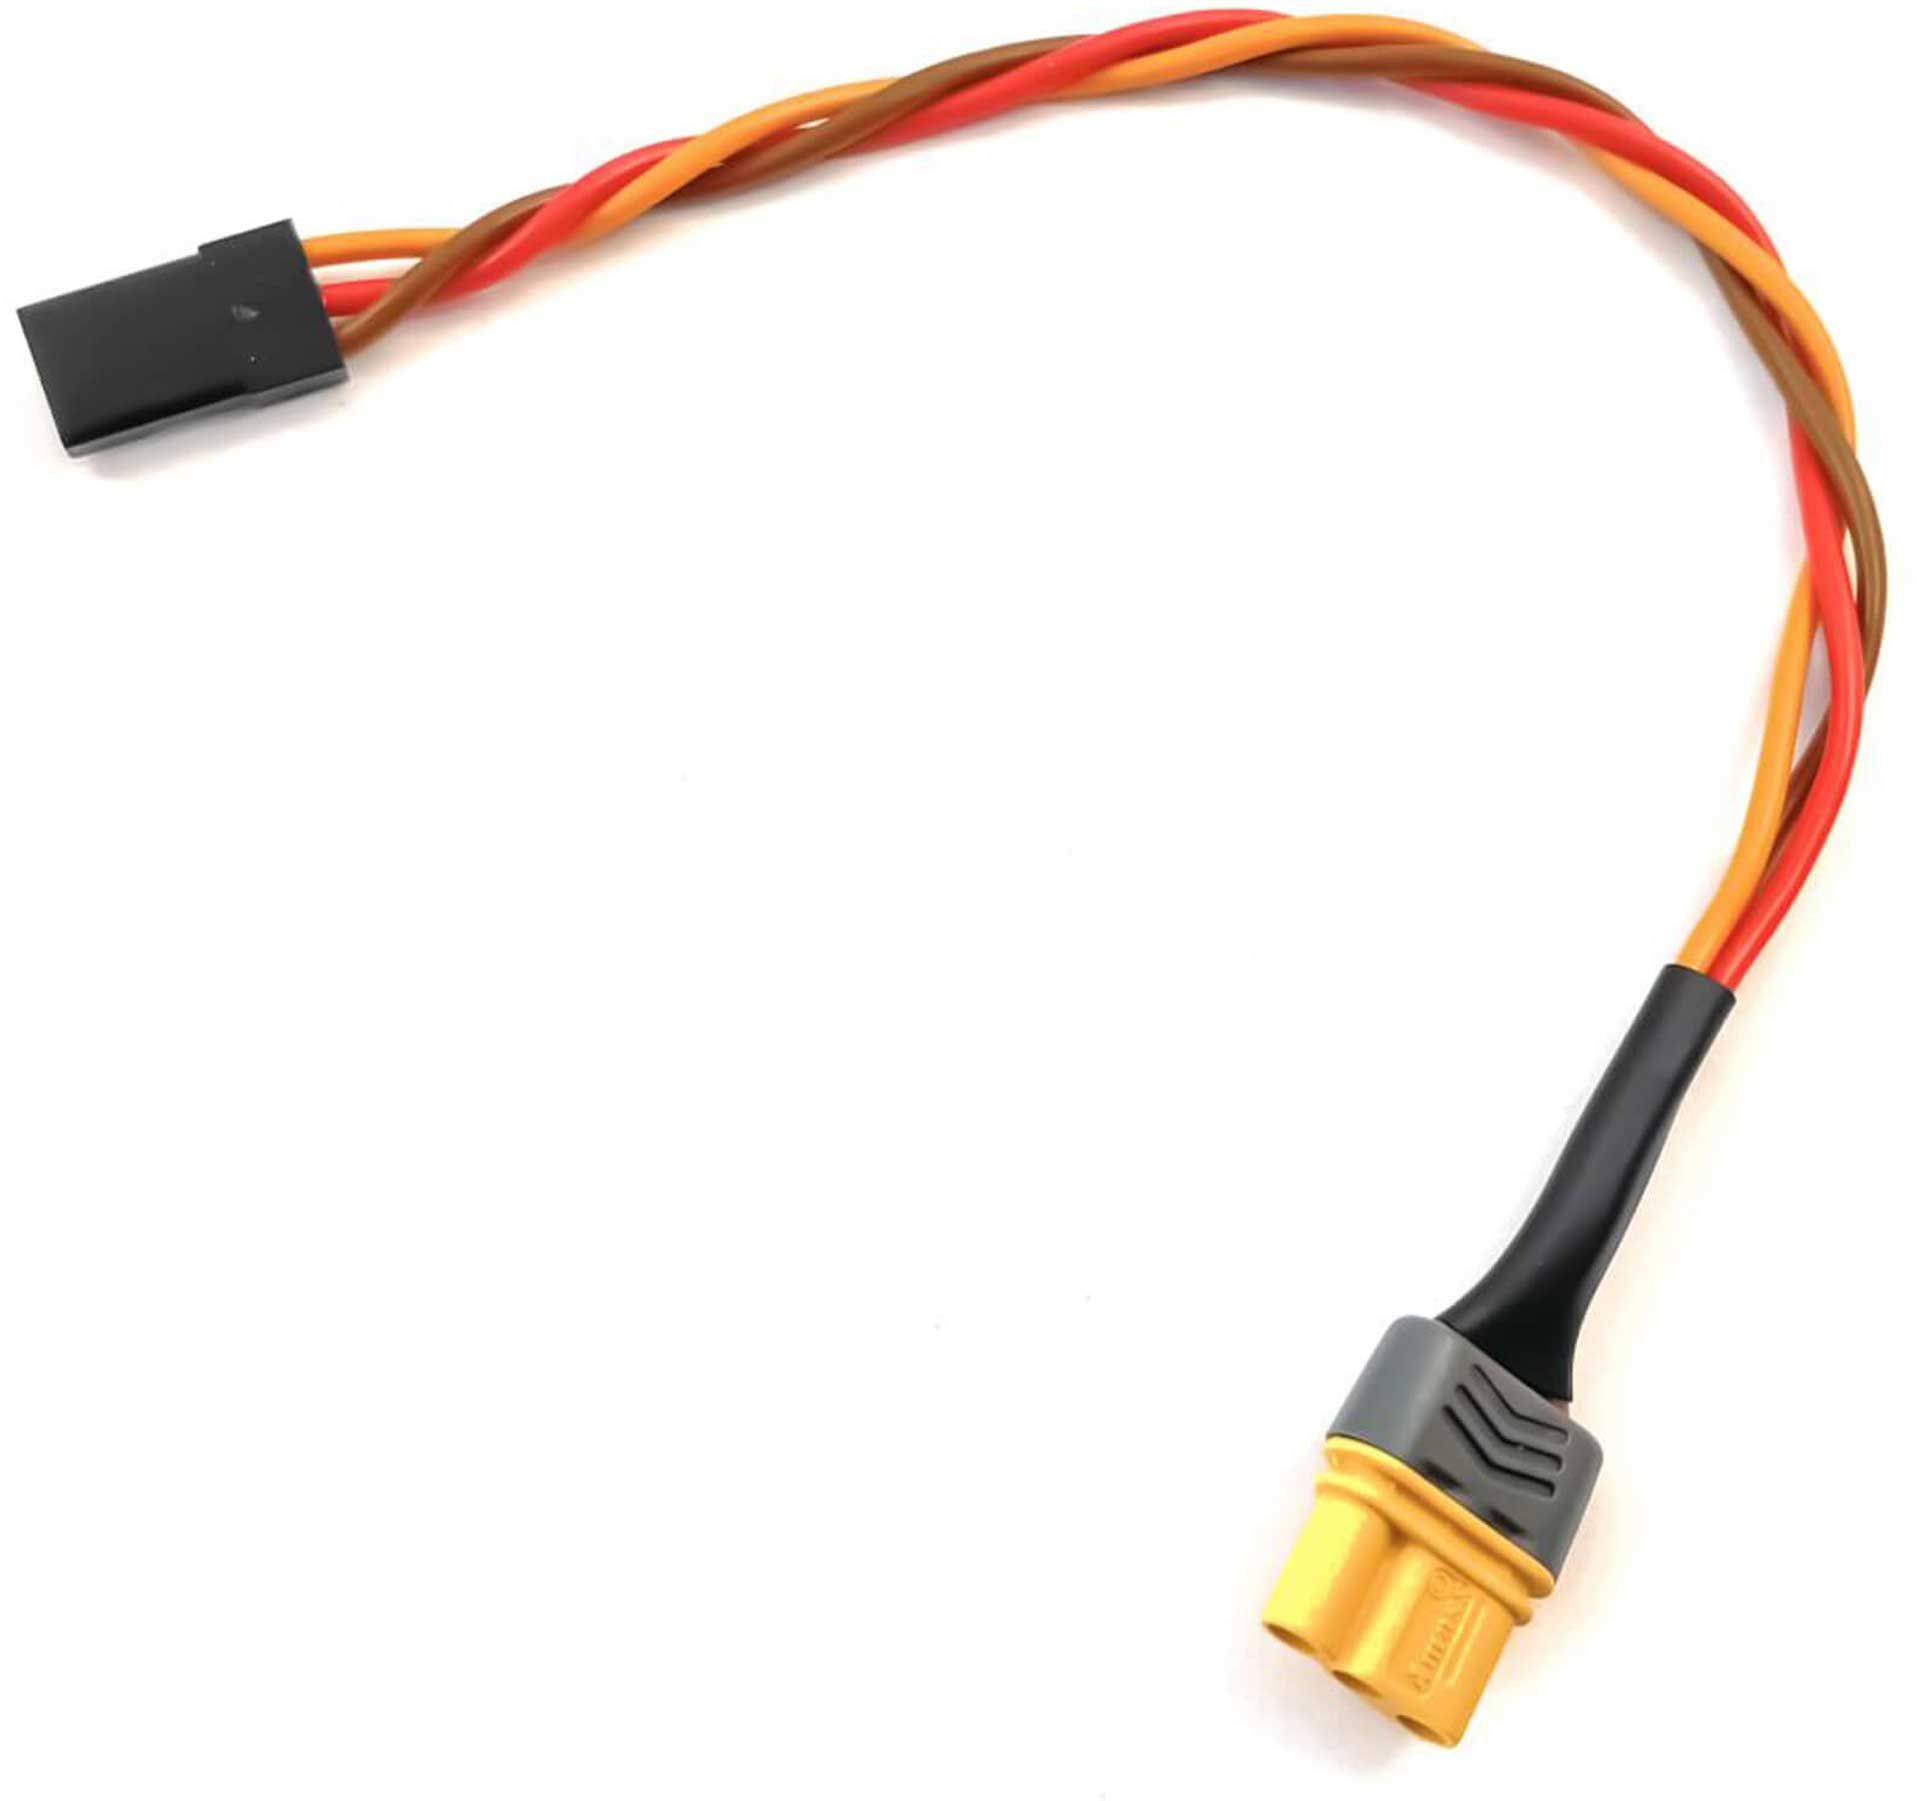 Hepf Adapter cable MR30 female to fit JR uu SE6 Servo Expander